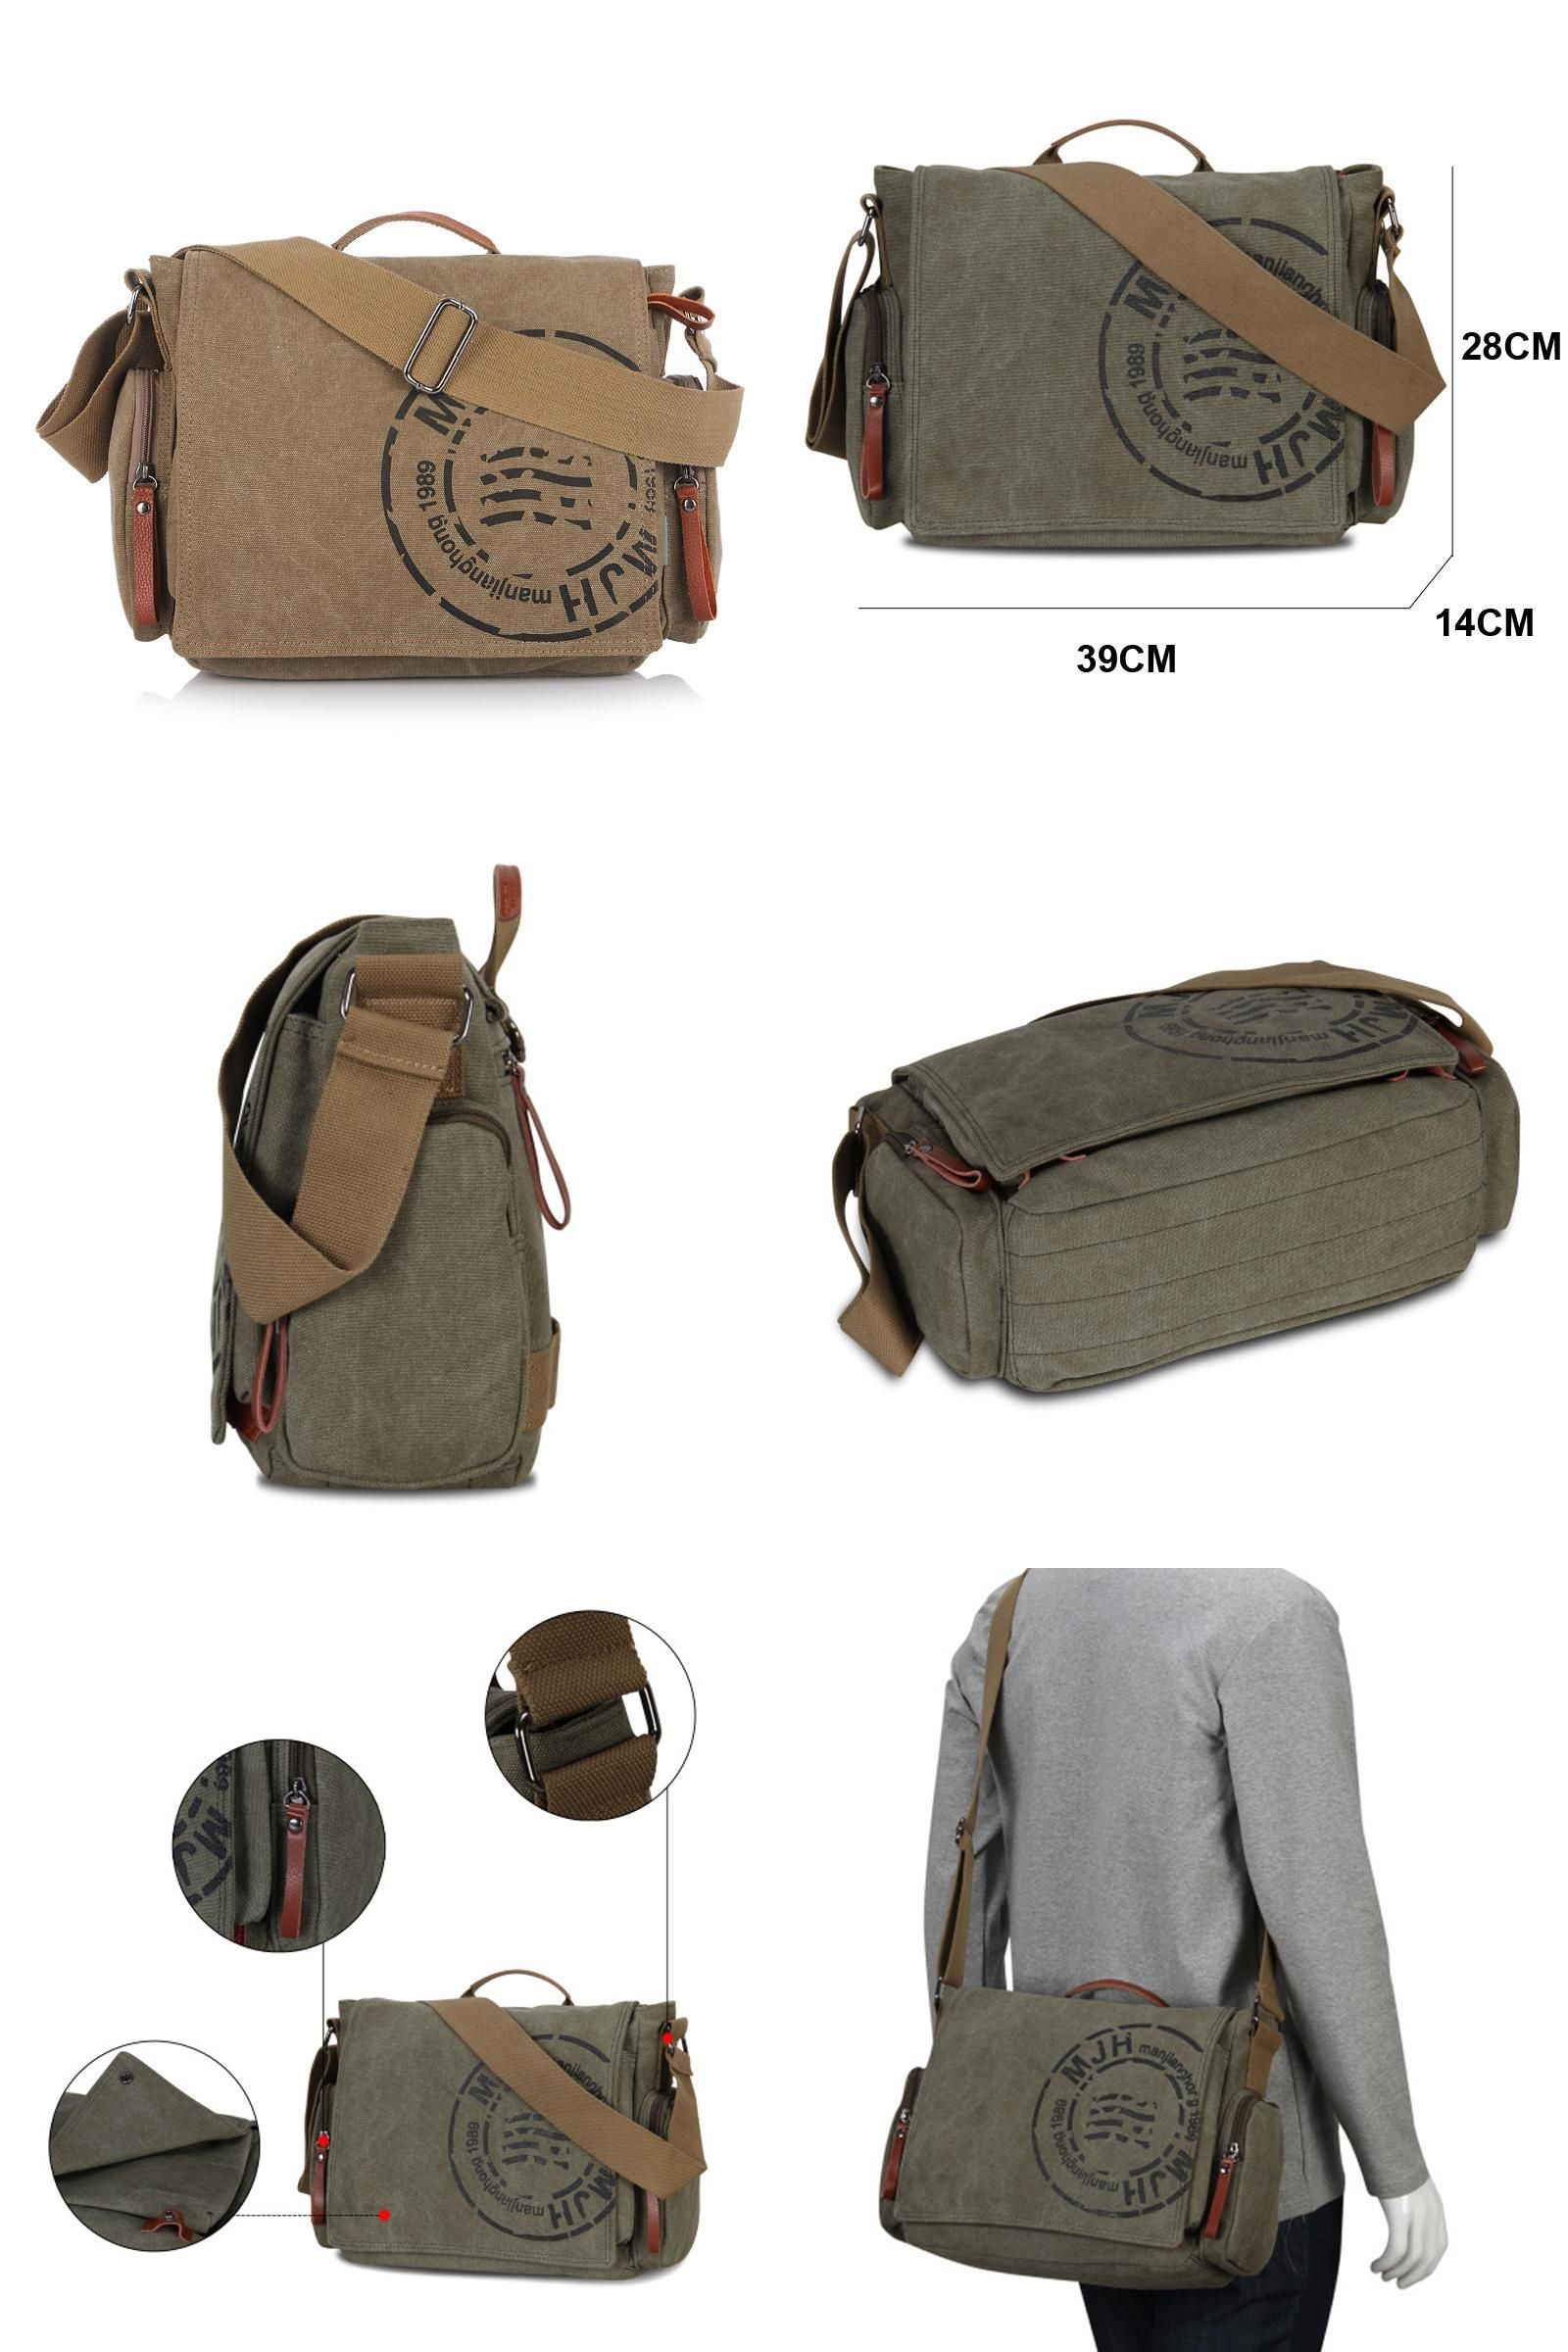 c5b47f214643 ... handbag buckle Suppliers  MANJIANGHONG Vintage Men s Messenger Bags  Canvas Shoulder Bag Fashion Men Business Crossbody Bag Printing Travel  Handbag 1124